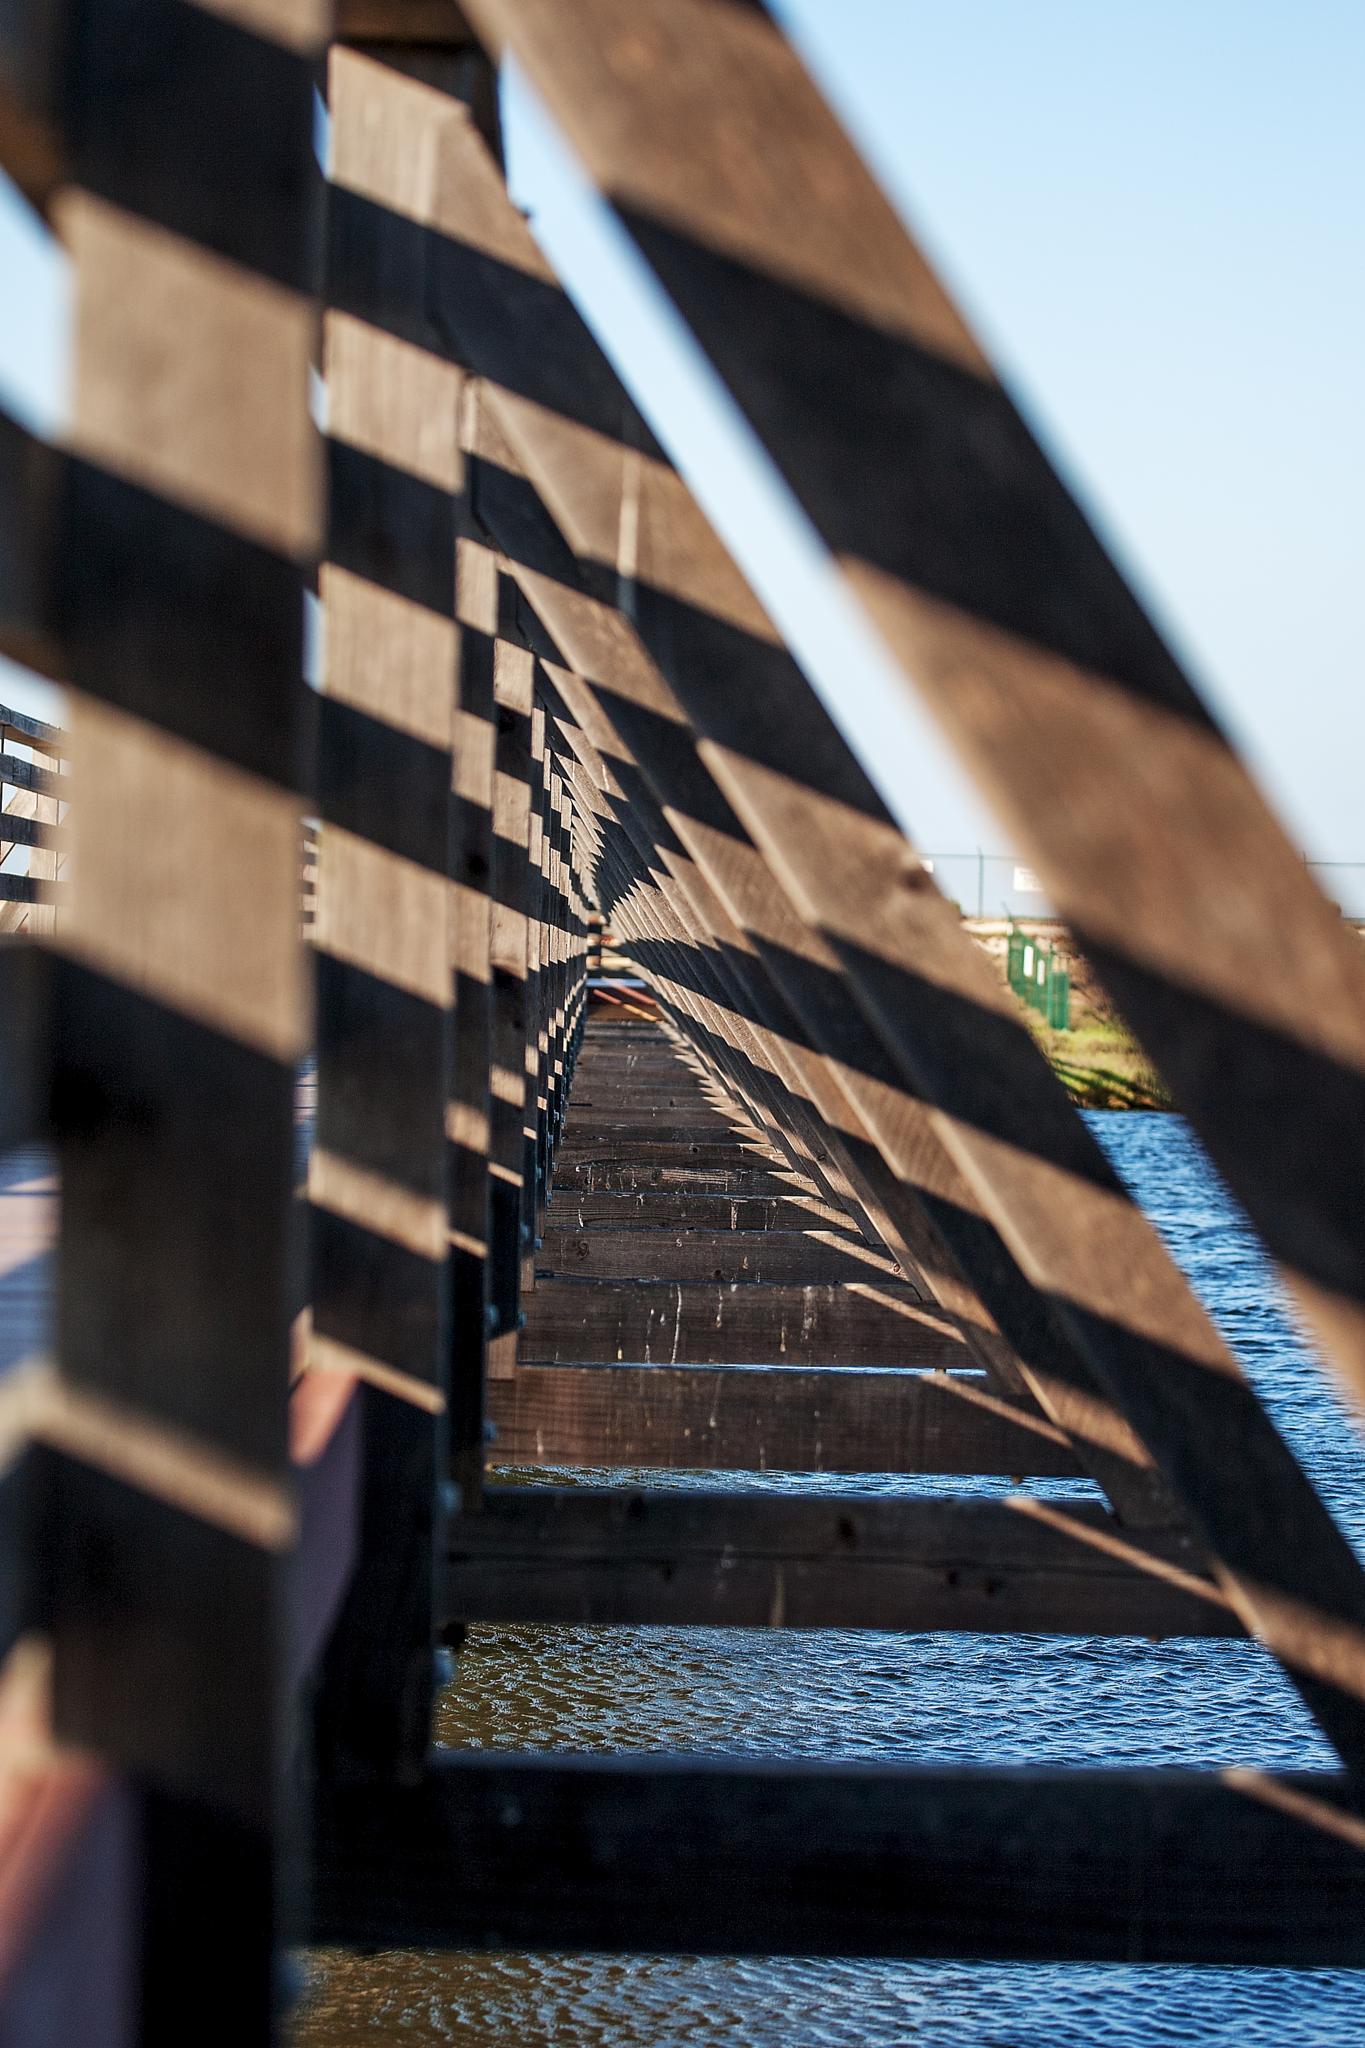 Bridge by eddyhsl